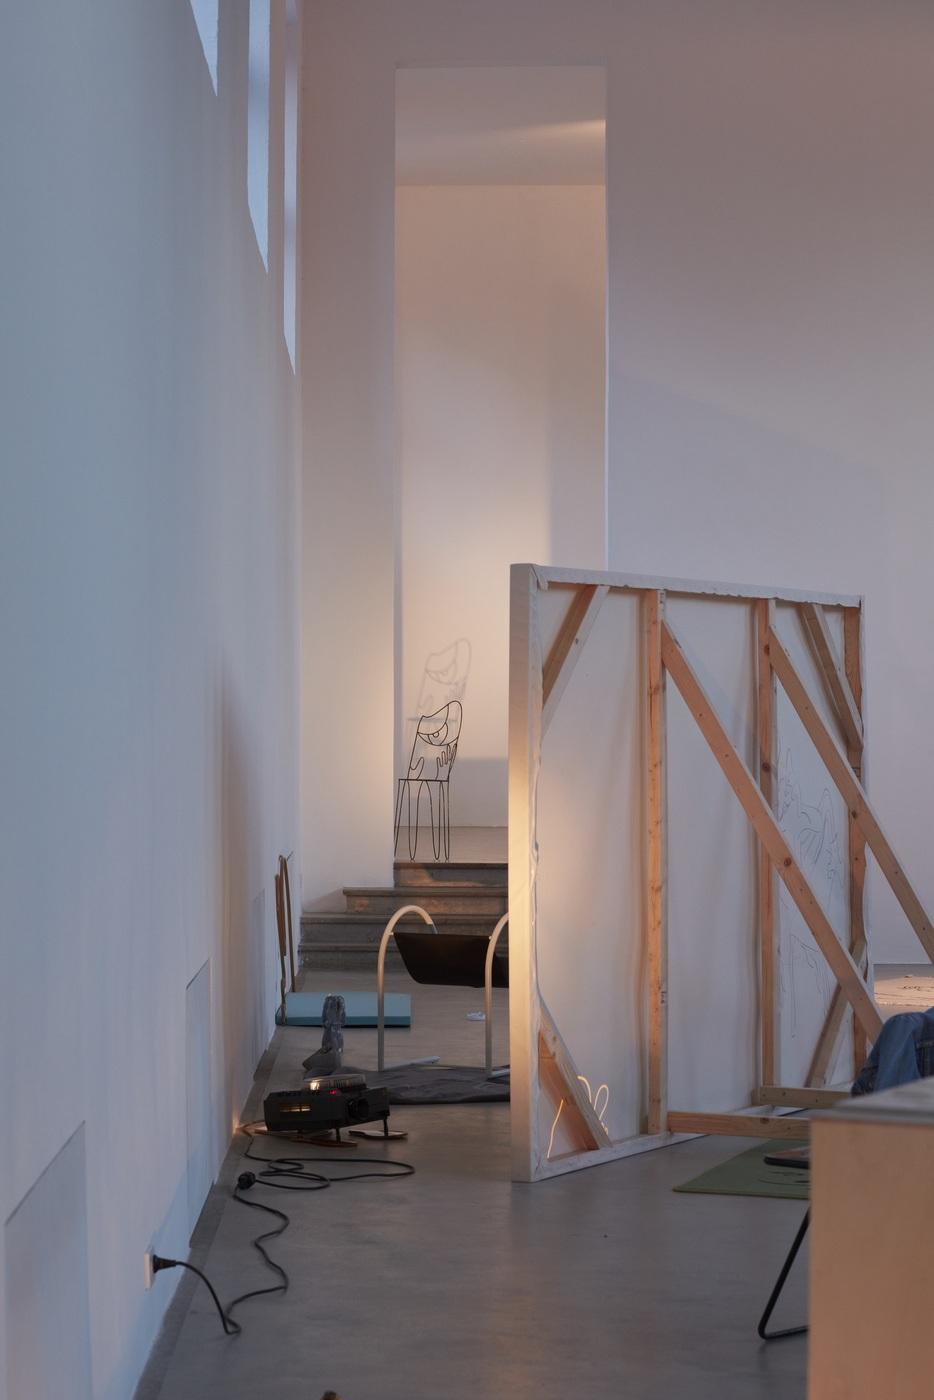 Ola Vasiljeva, You've got beautiful stairs, you know, exhibition view in Kunstverein München 2016 © Kunstverein München e.V._11